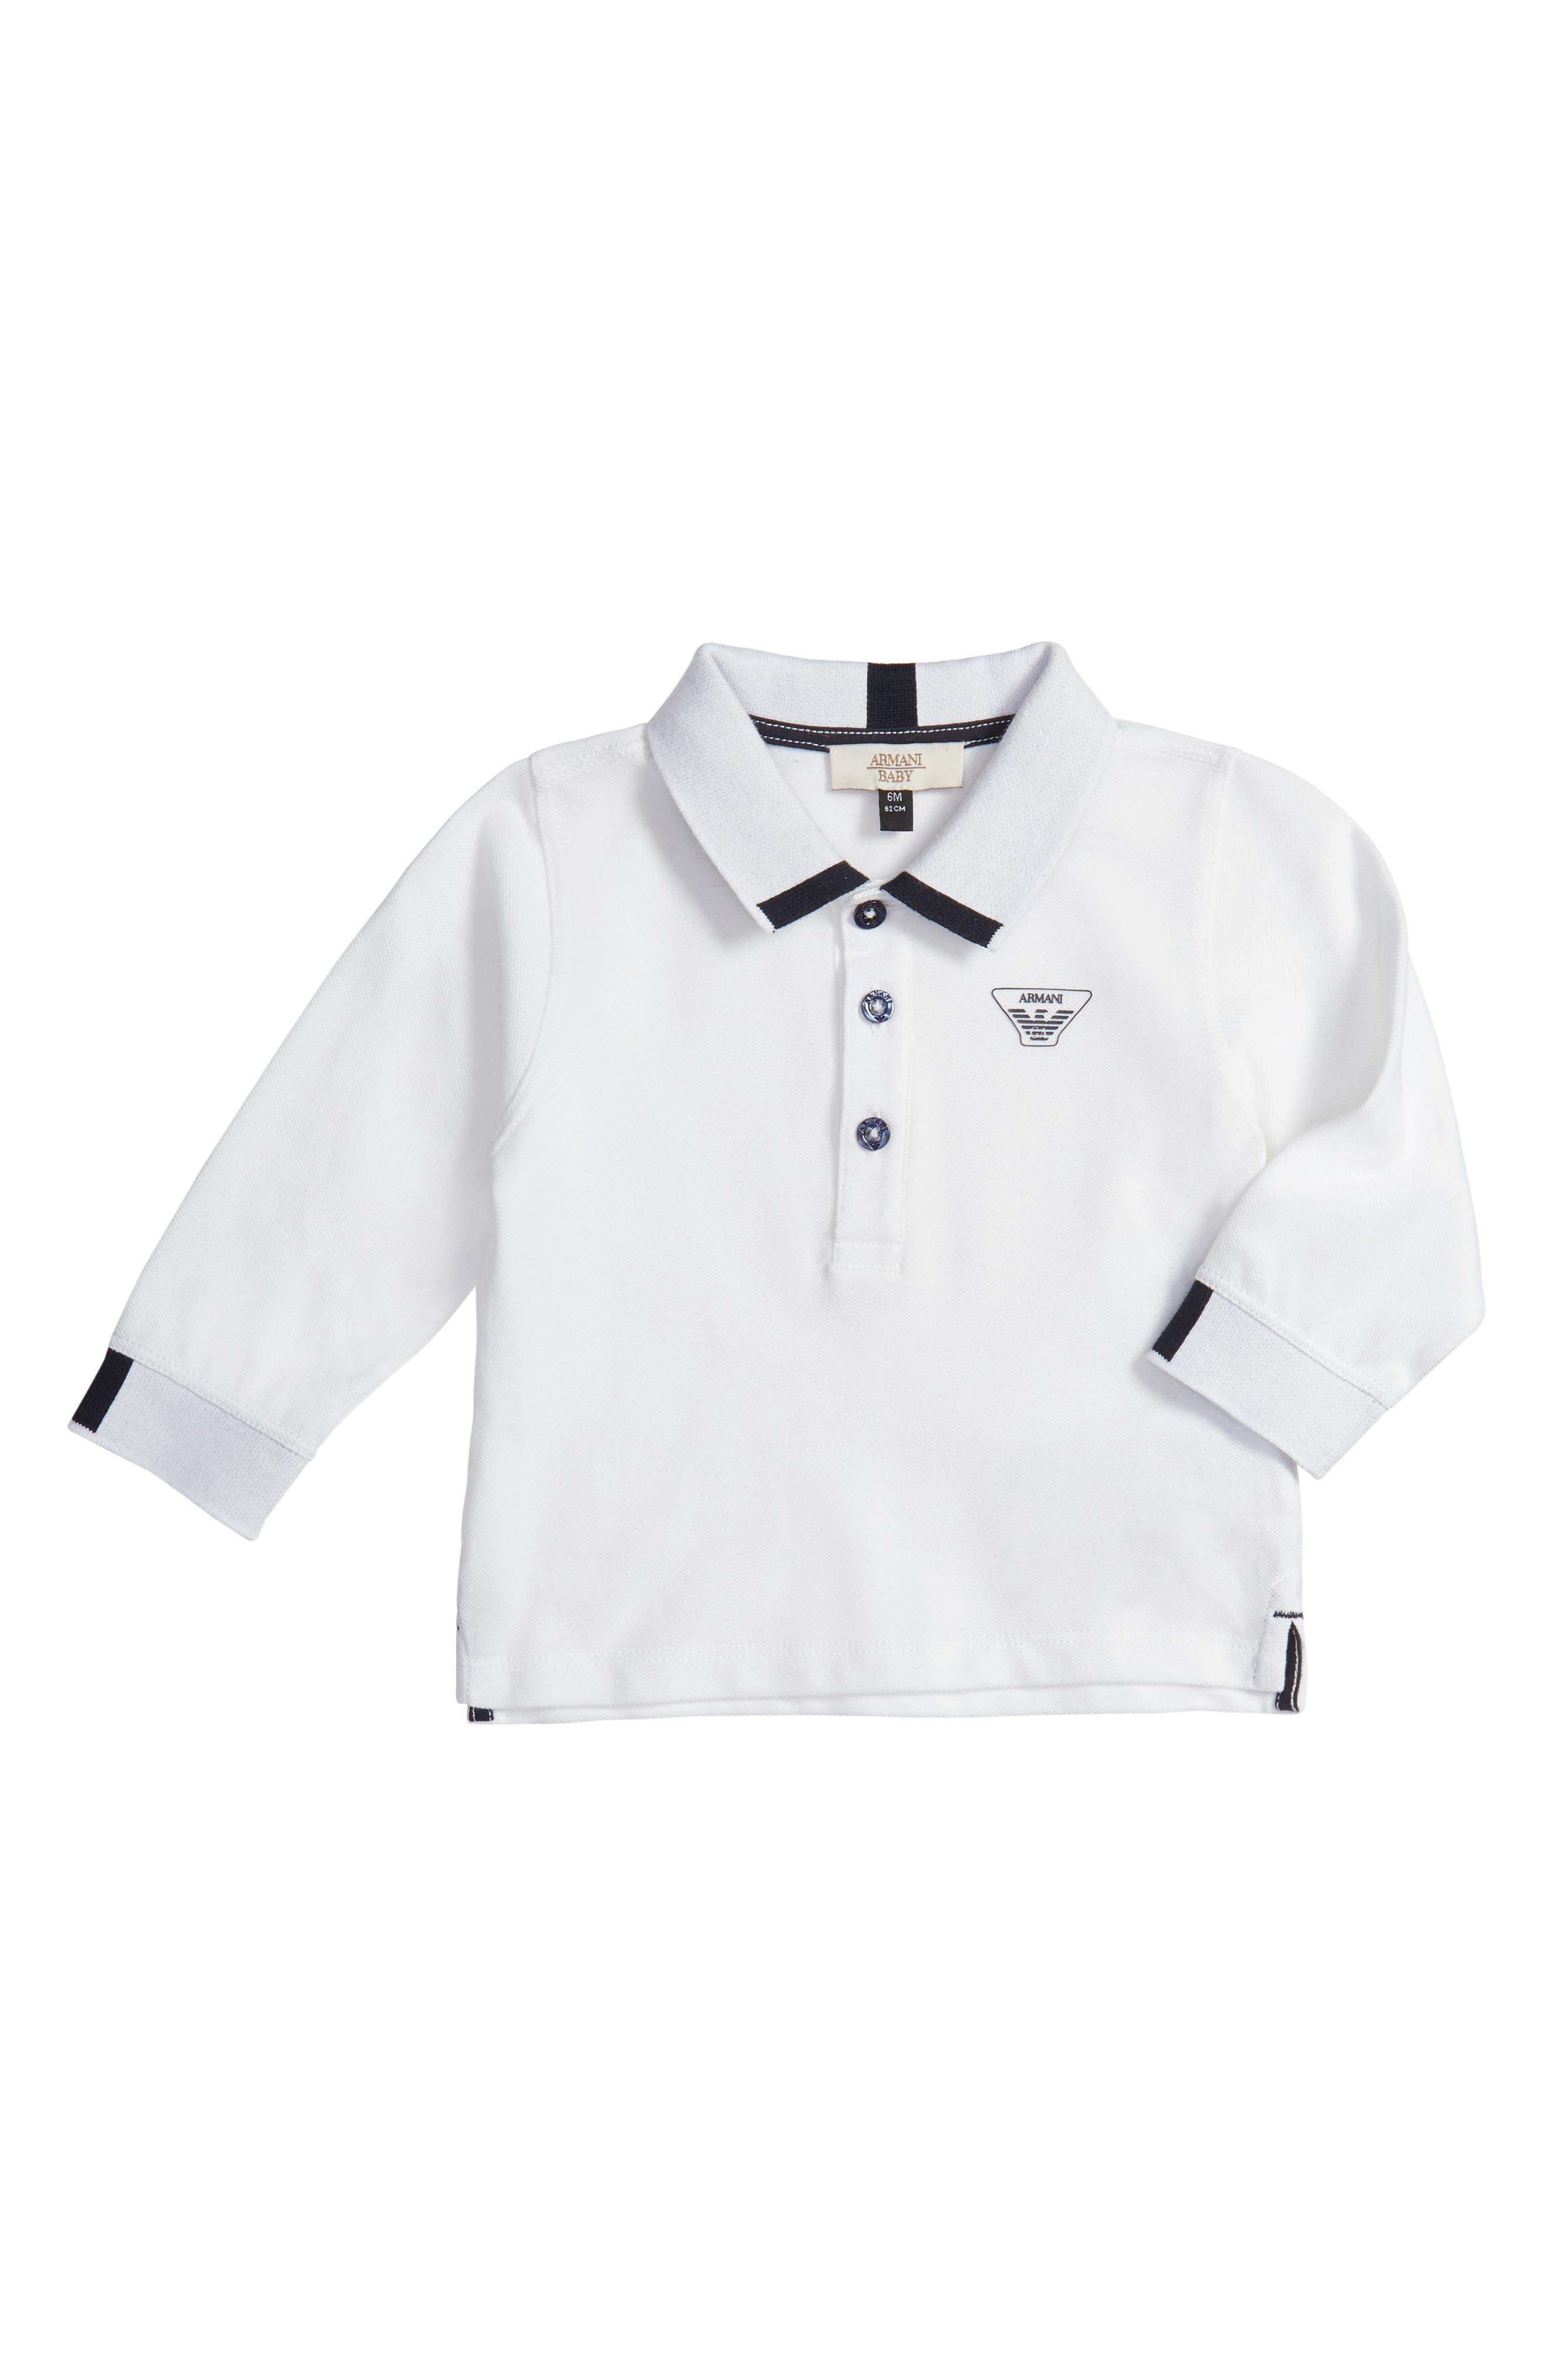 Alternate Image 1 Selected - Armani Junior Long Sleeve Piqué Polo (Baby Boys)